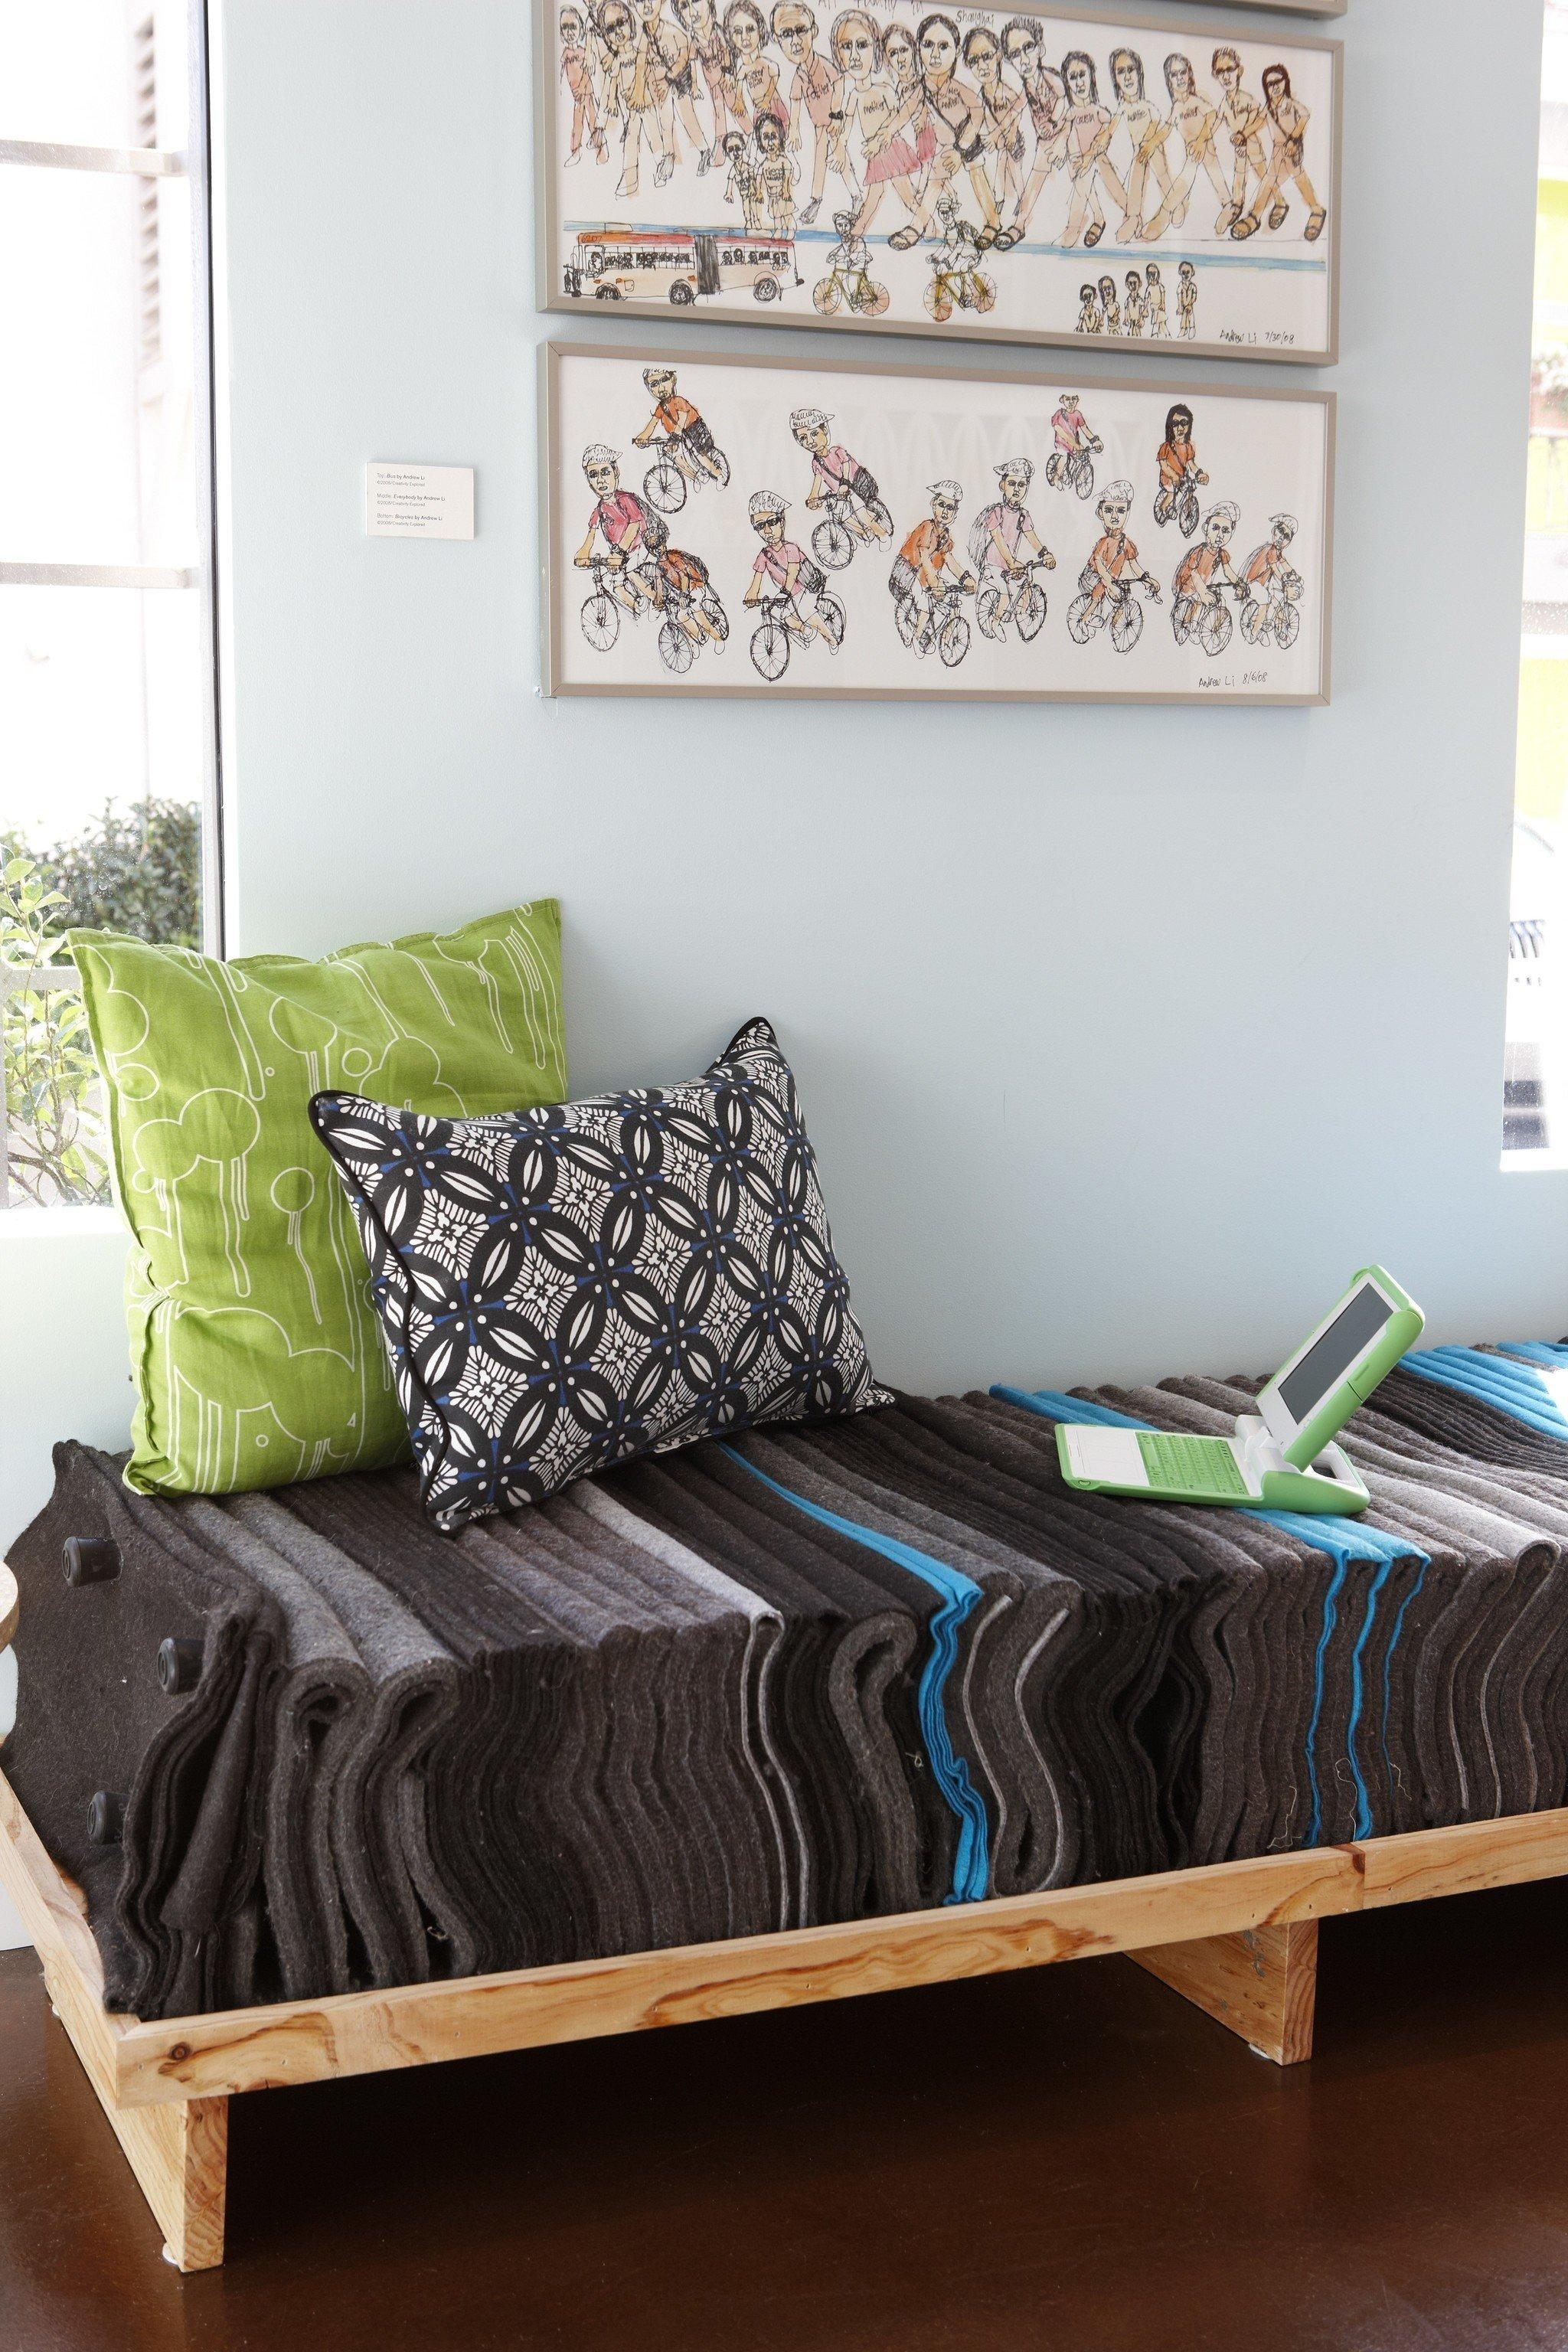 bed sheet hardwood living room bed frame studio couch pillow textile Bedroom